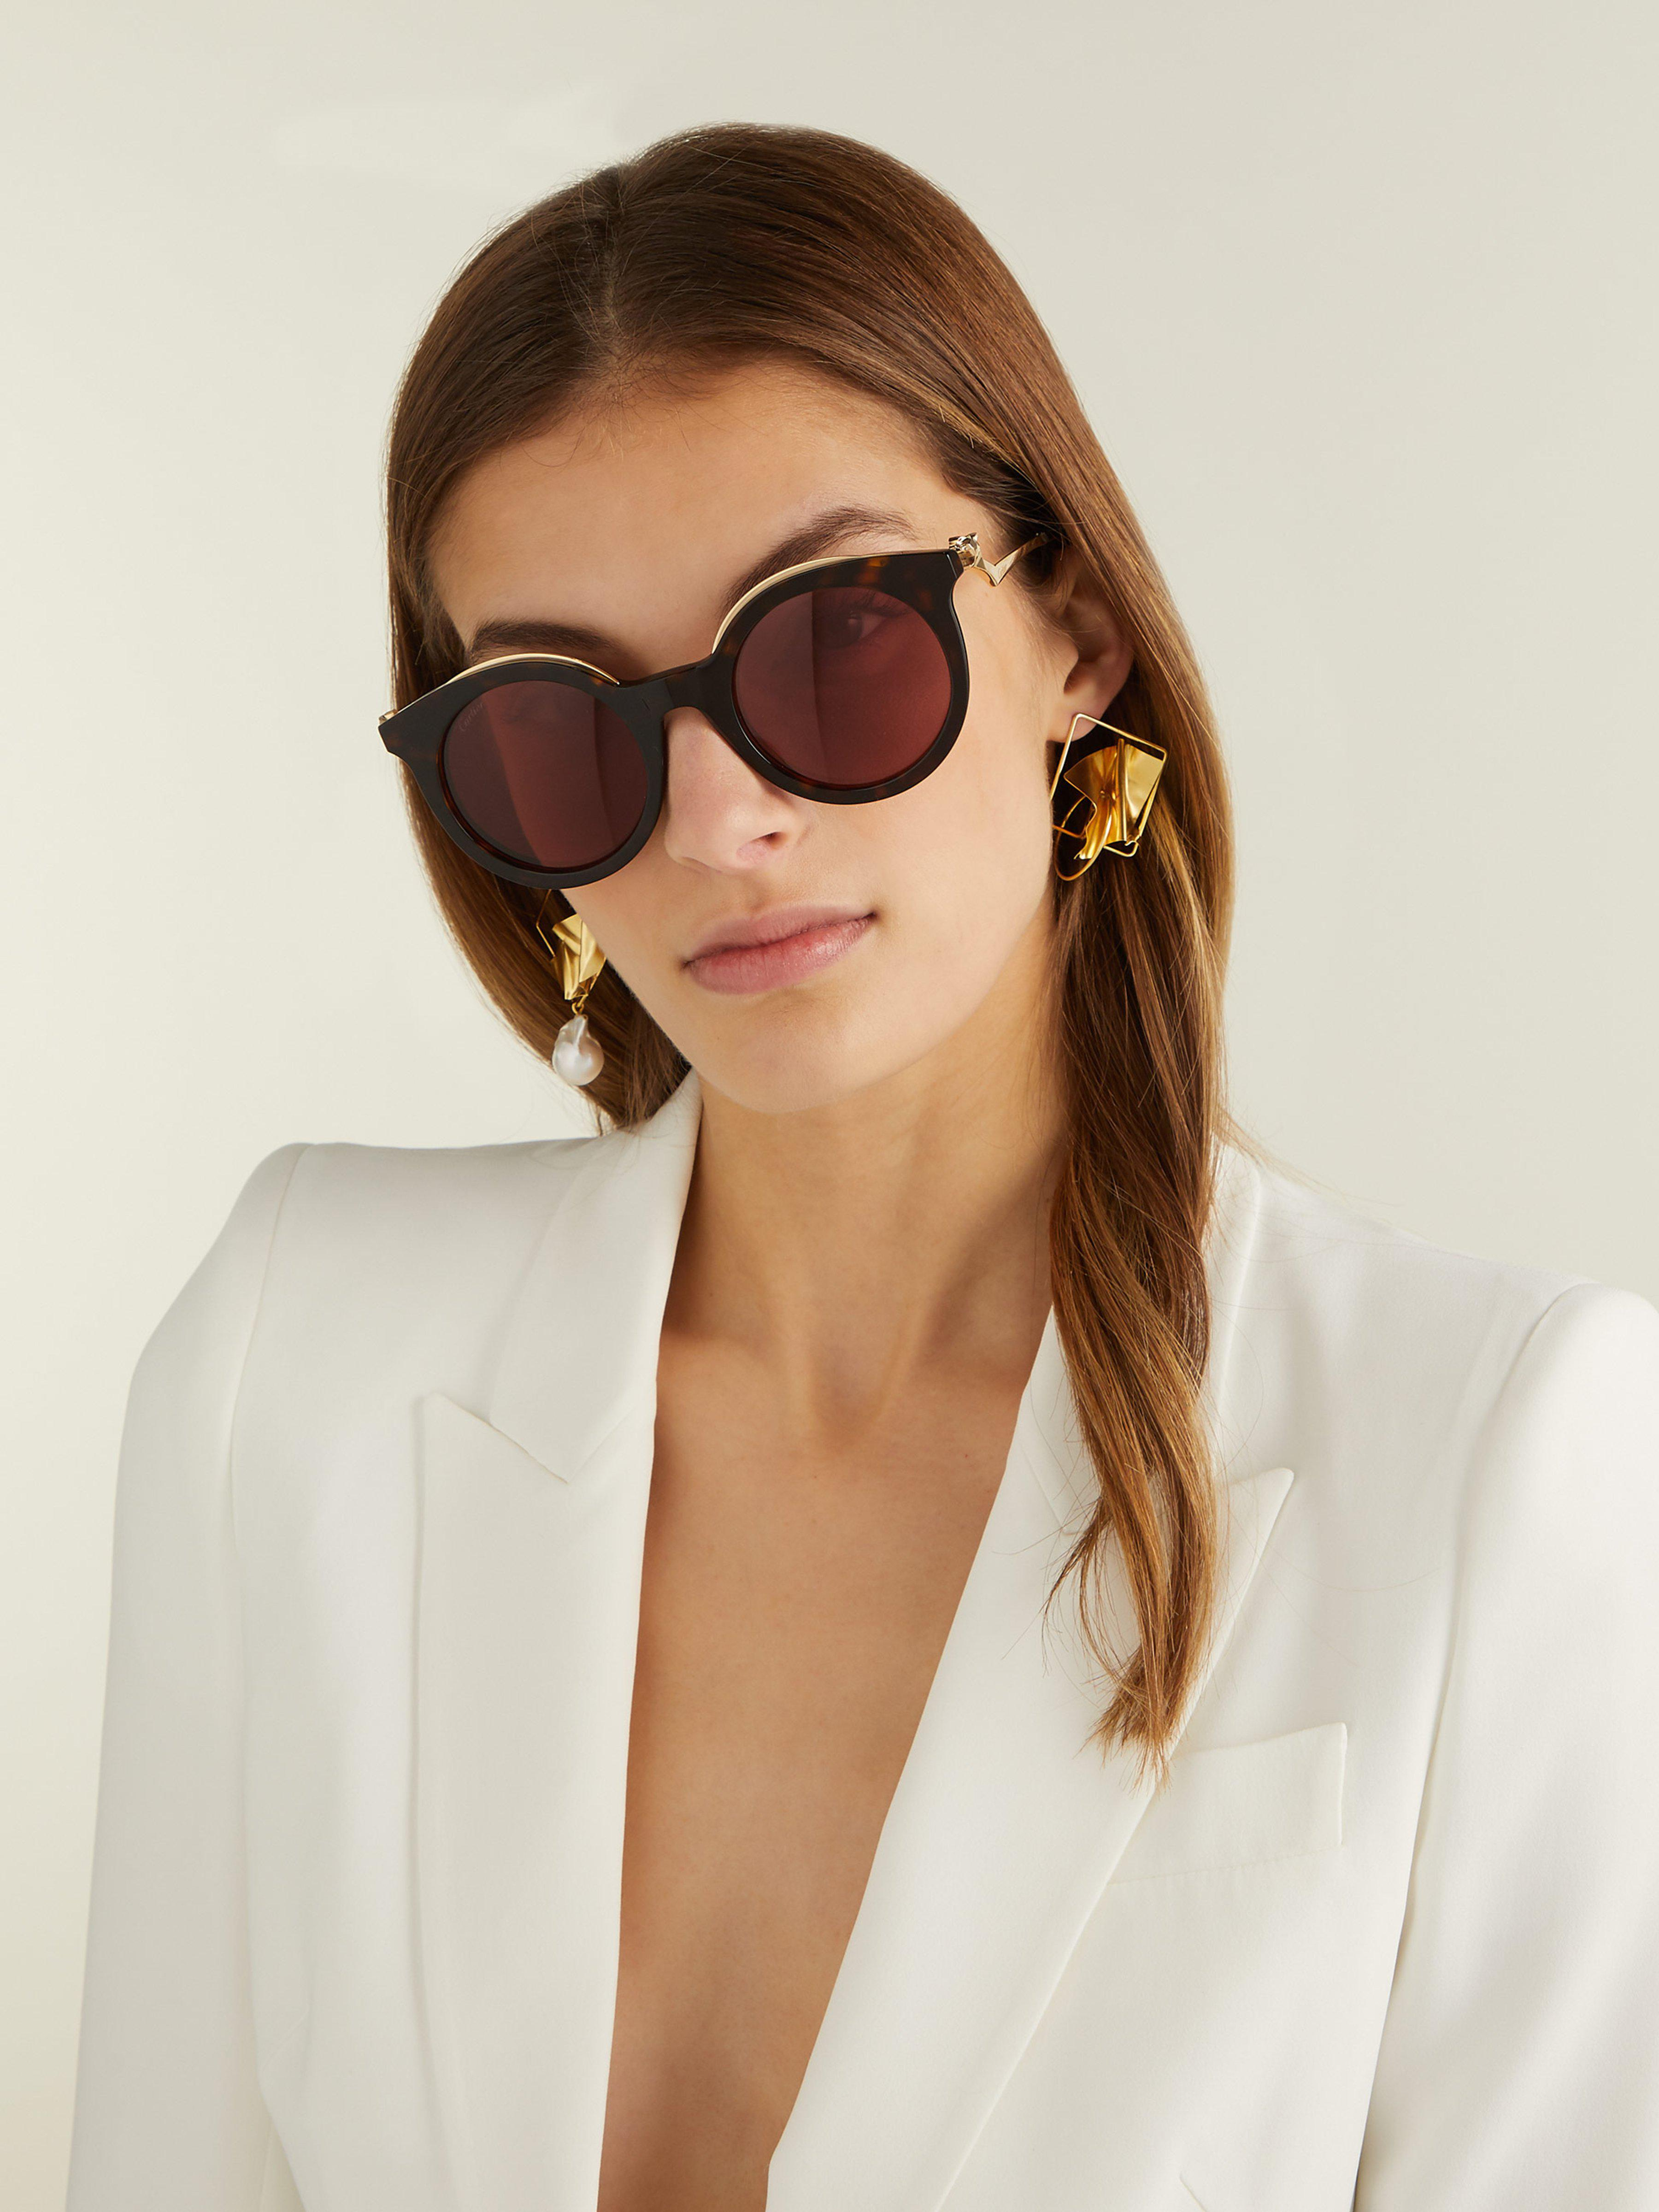 de9cee12bf8b Cartier Cat Eye Tortoiseshell Sunglasses in Brown - Lyst